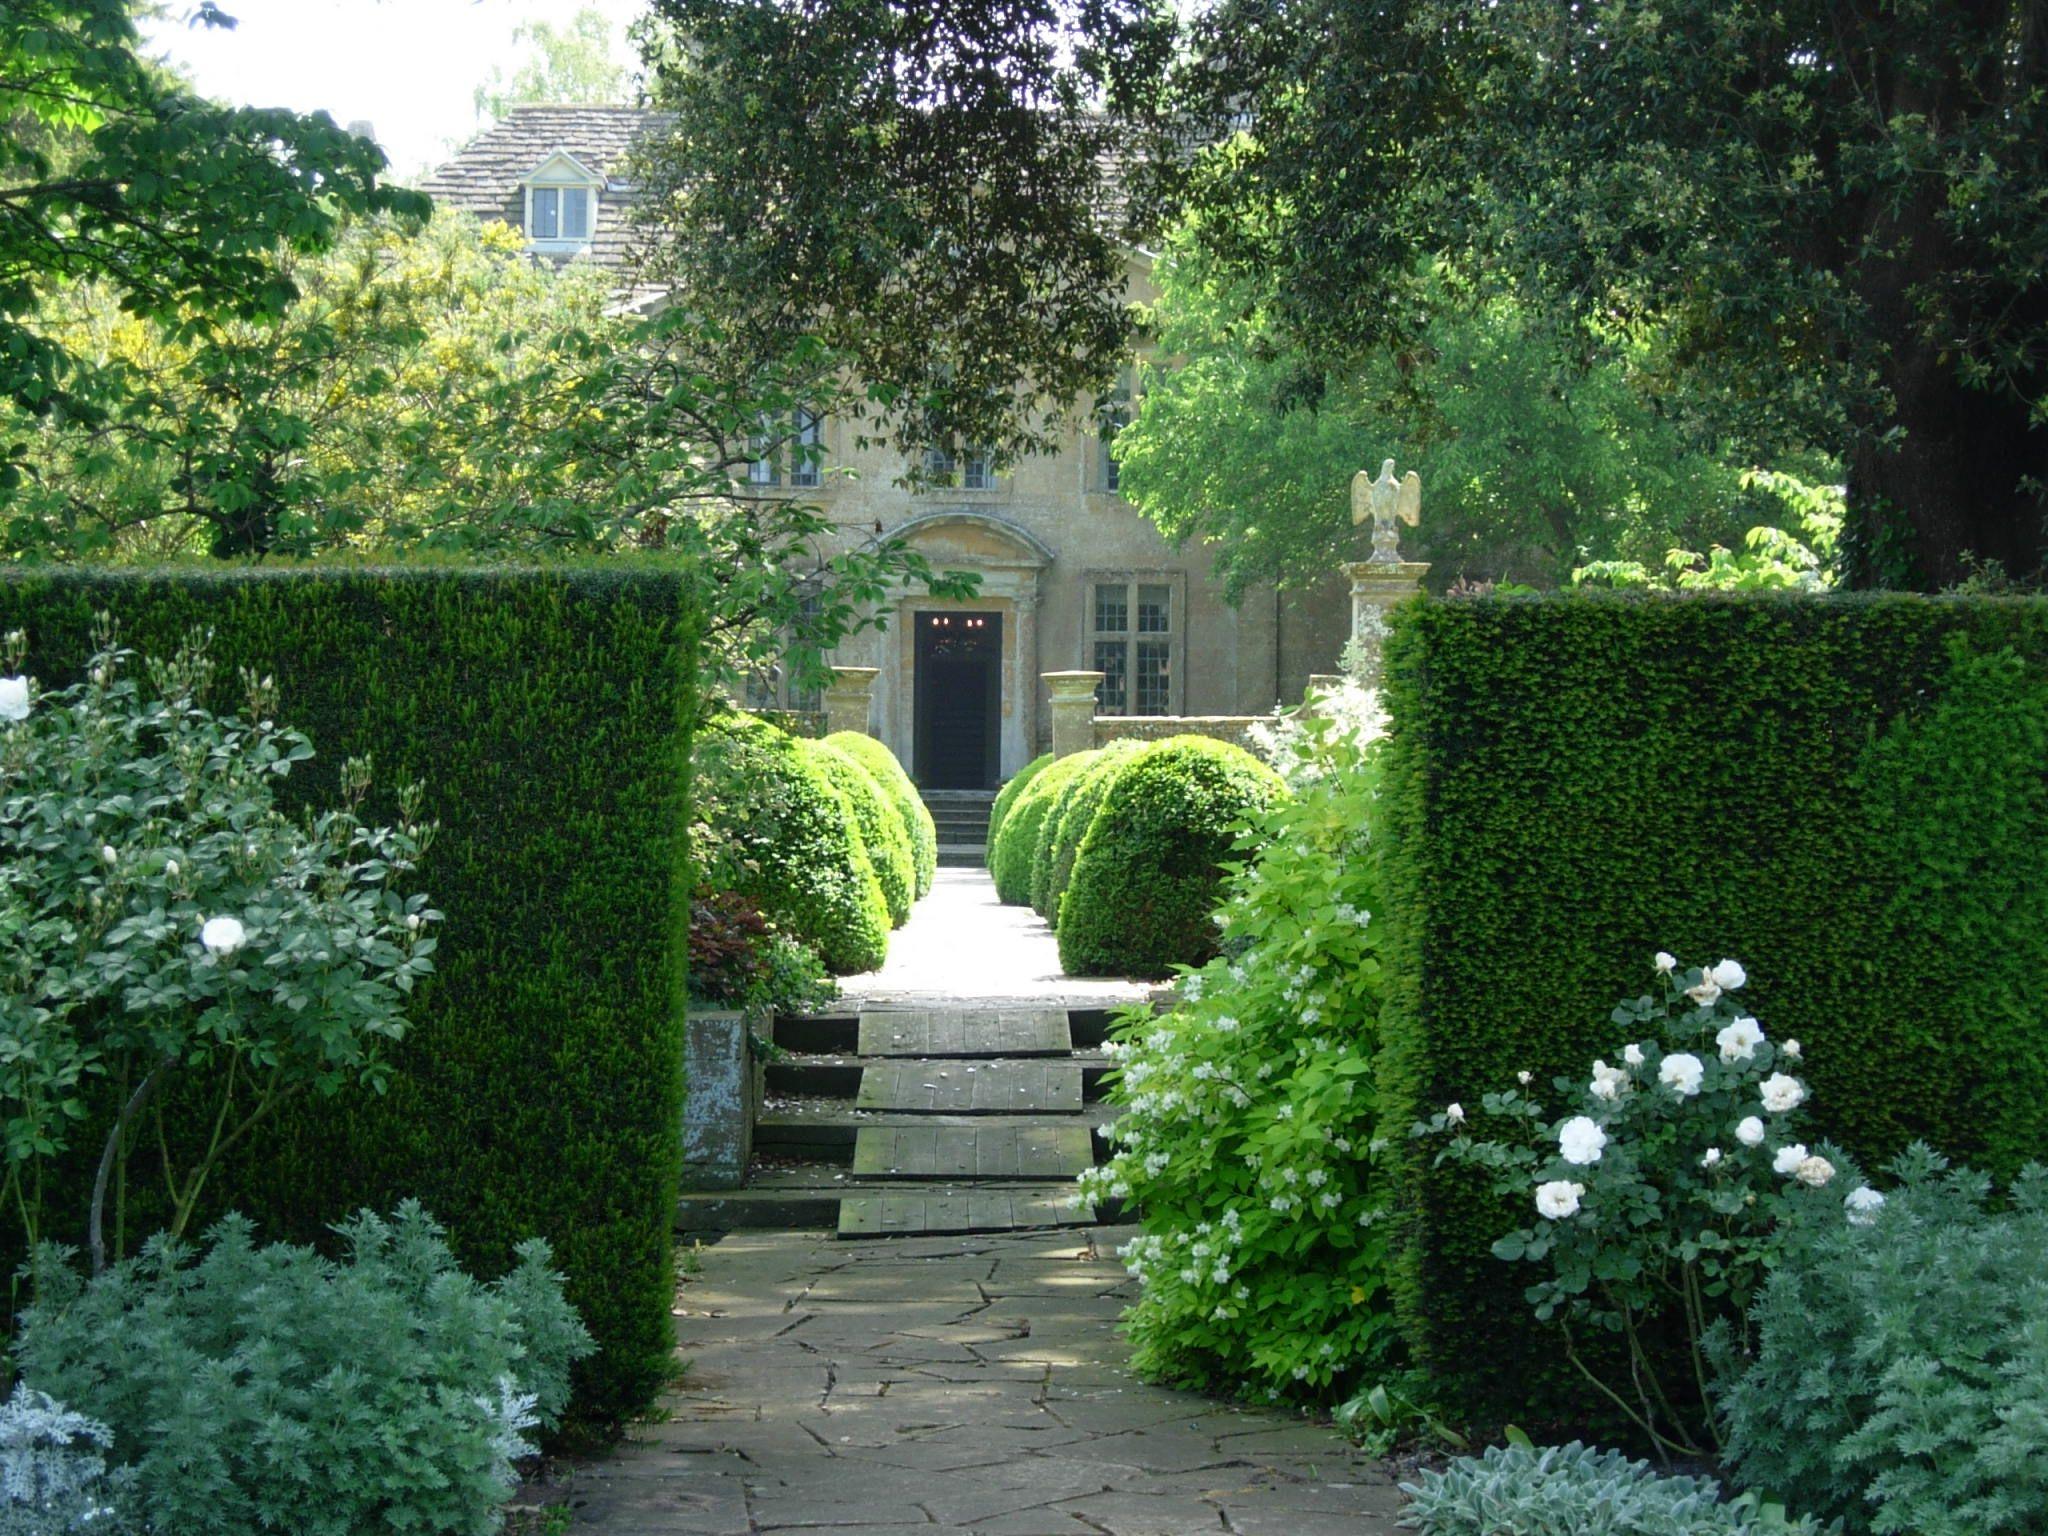 tintinhull garden near yeovil somerset the arts and crafts style garden was originally - Garden Sheds Yeovil